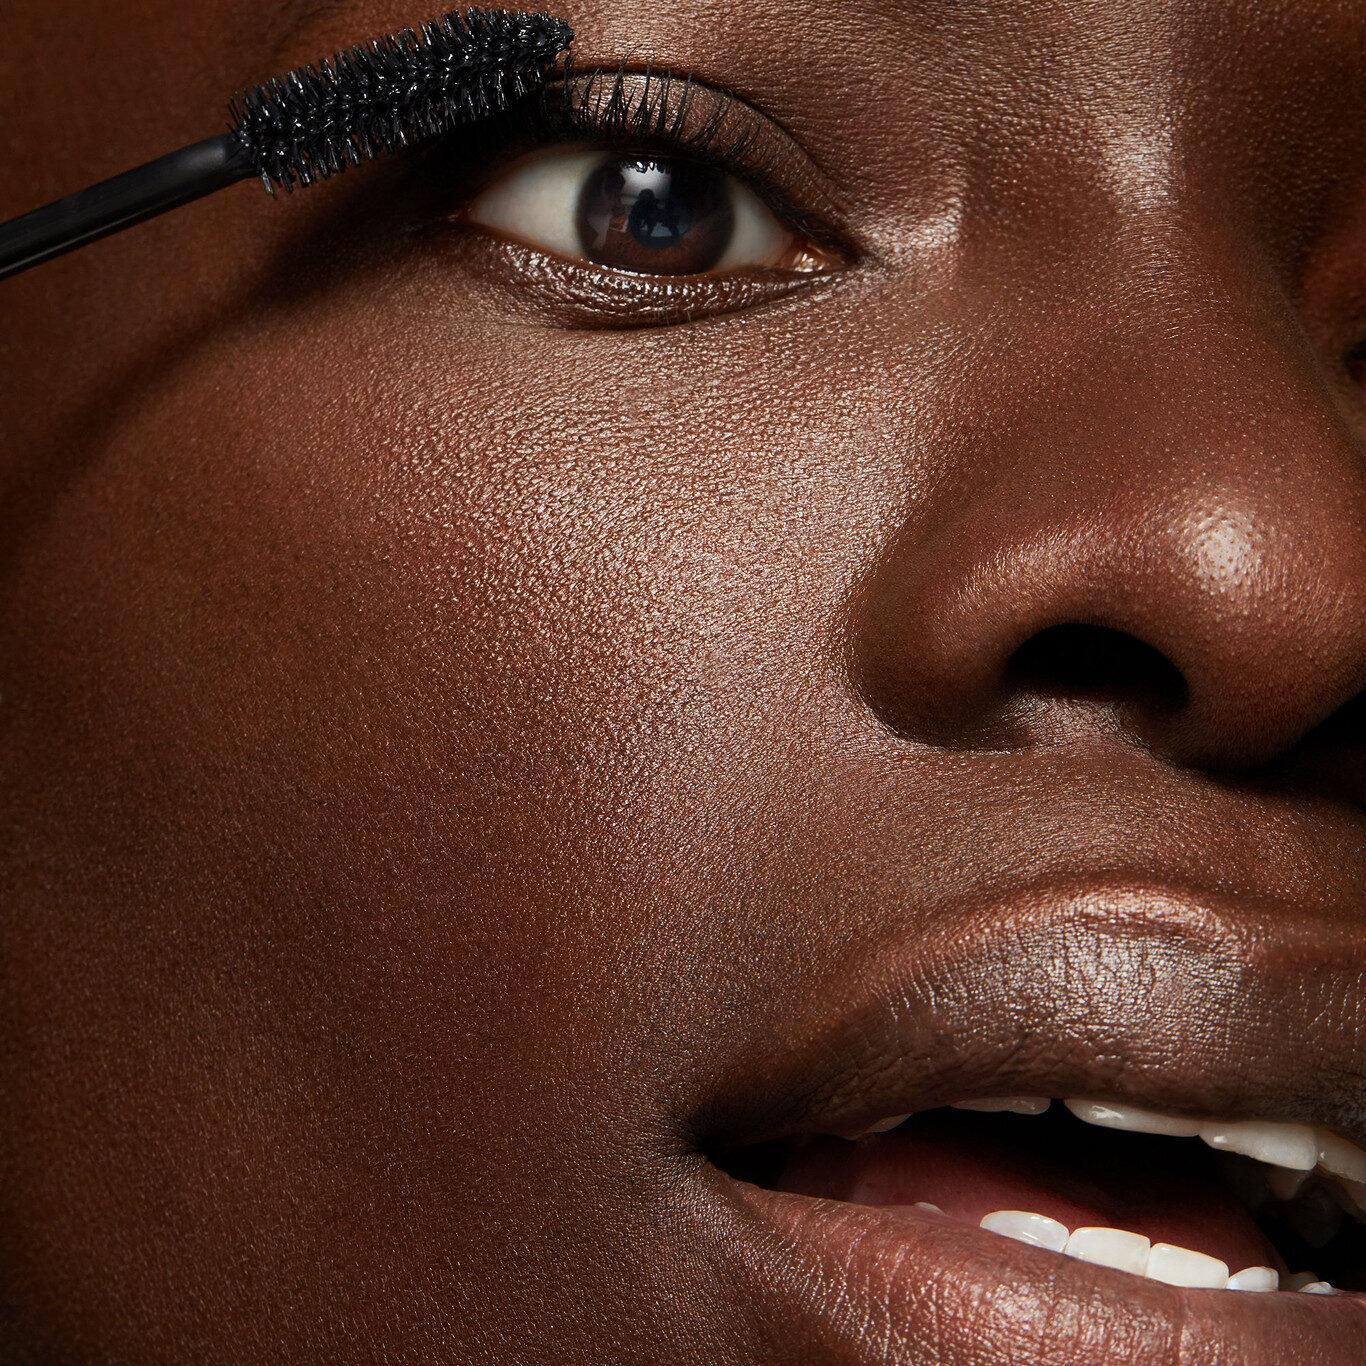 ColourPop Cosmetics Act Natural Defining Mascara In Black Model